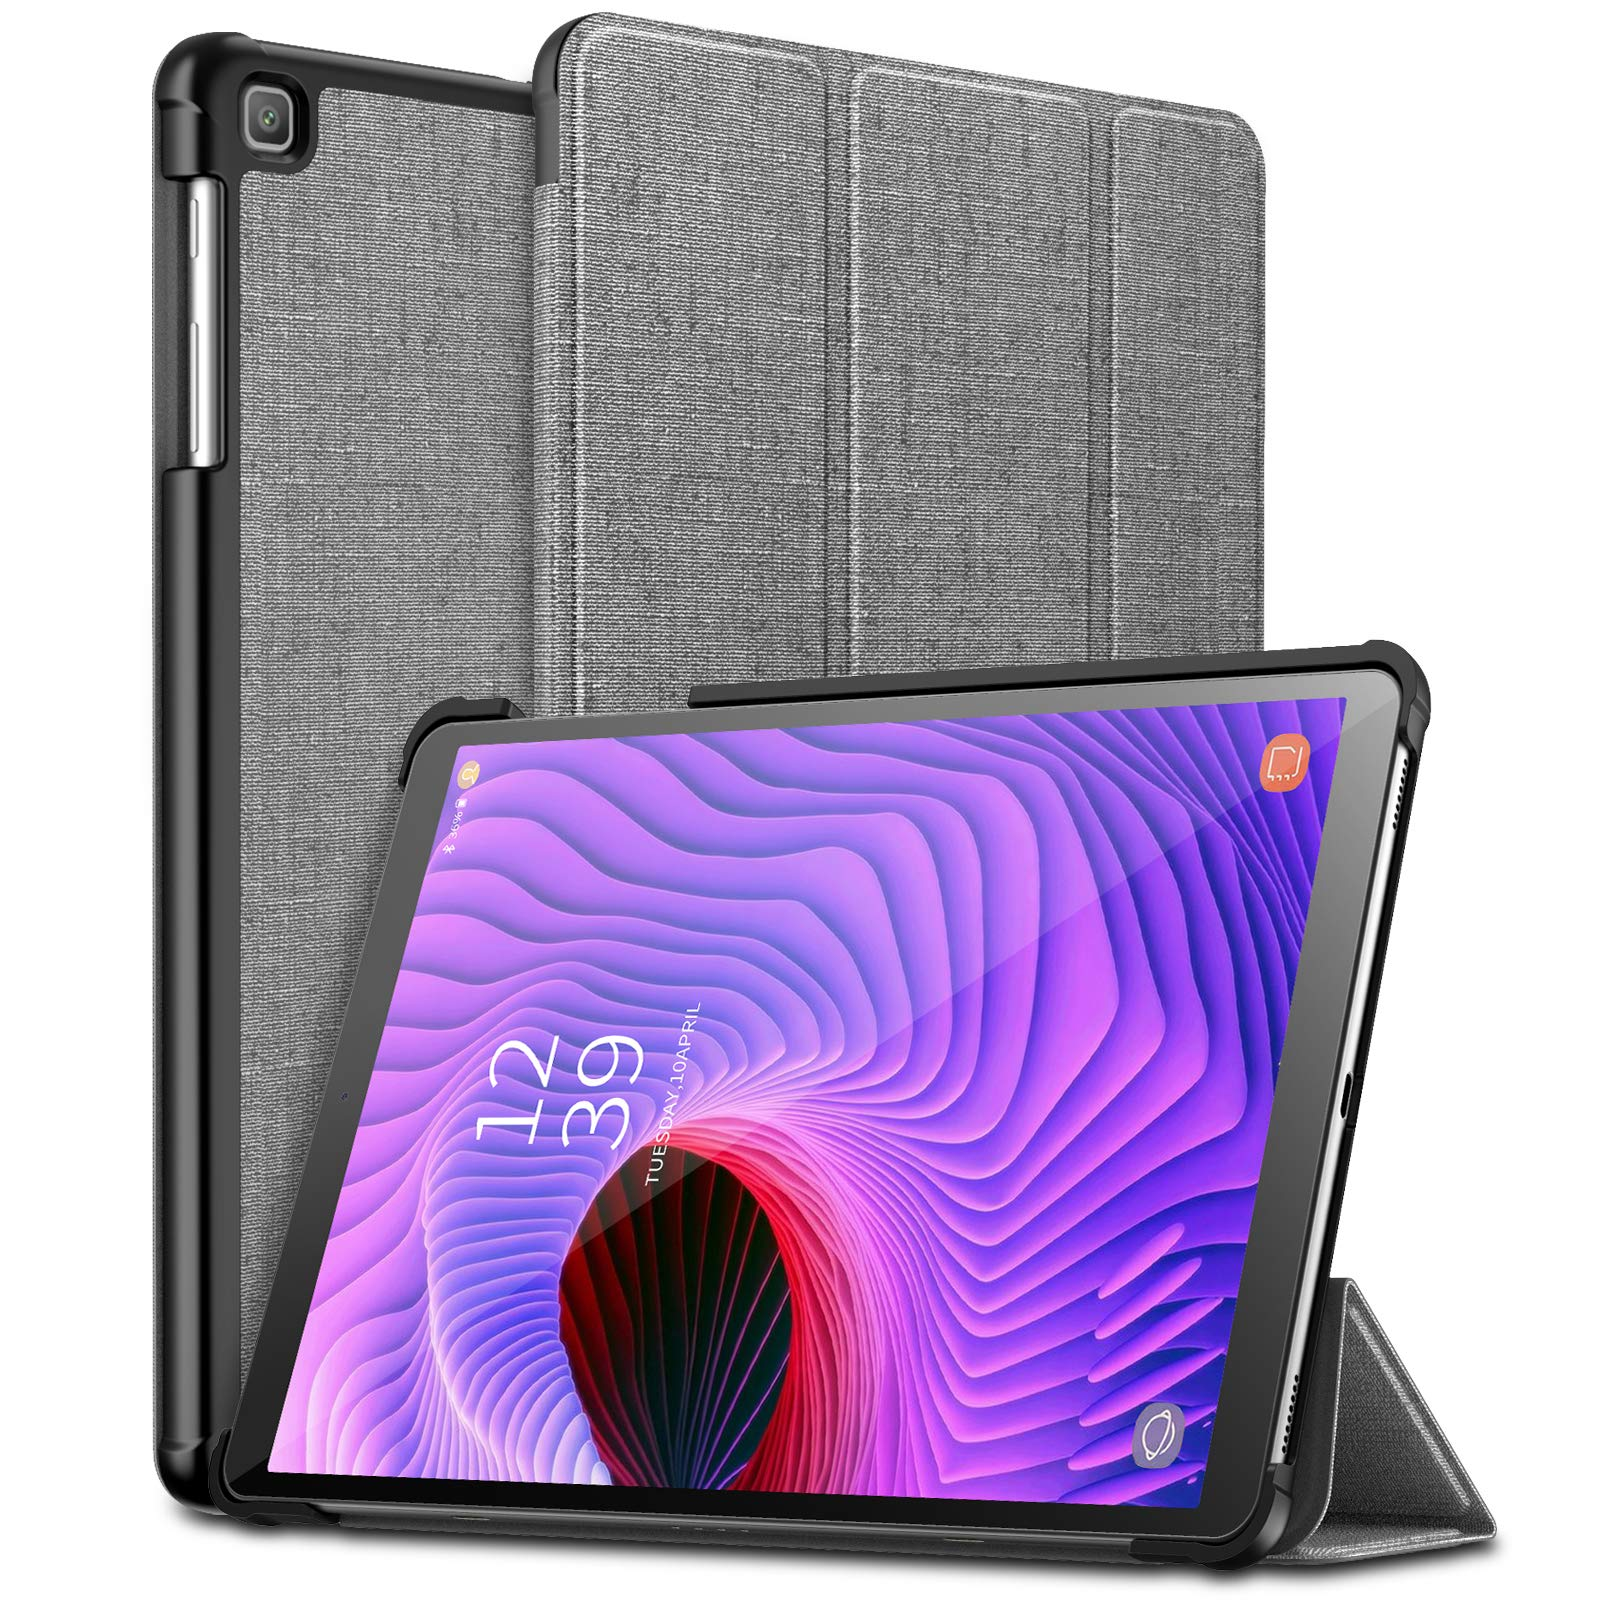 Funda Samsung Galaxy Tab A 10.1 SM-T510 (2019) INFILAND [7PKCSC5L]